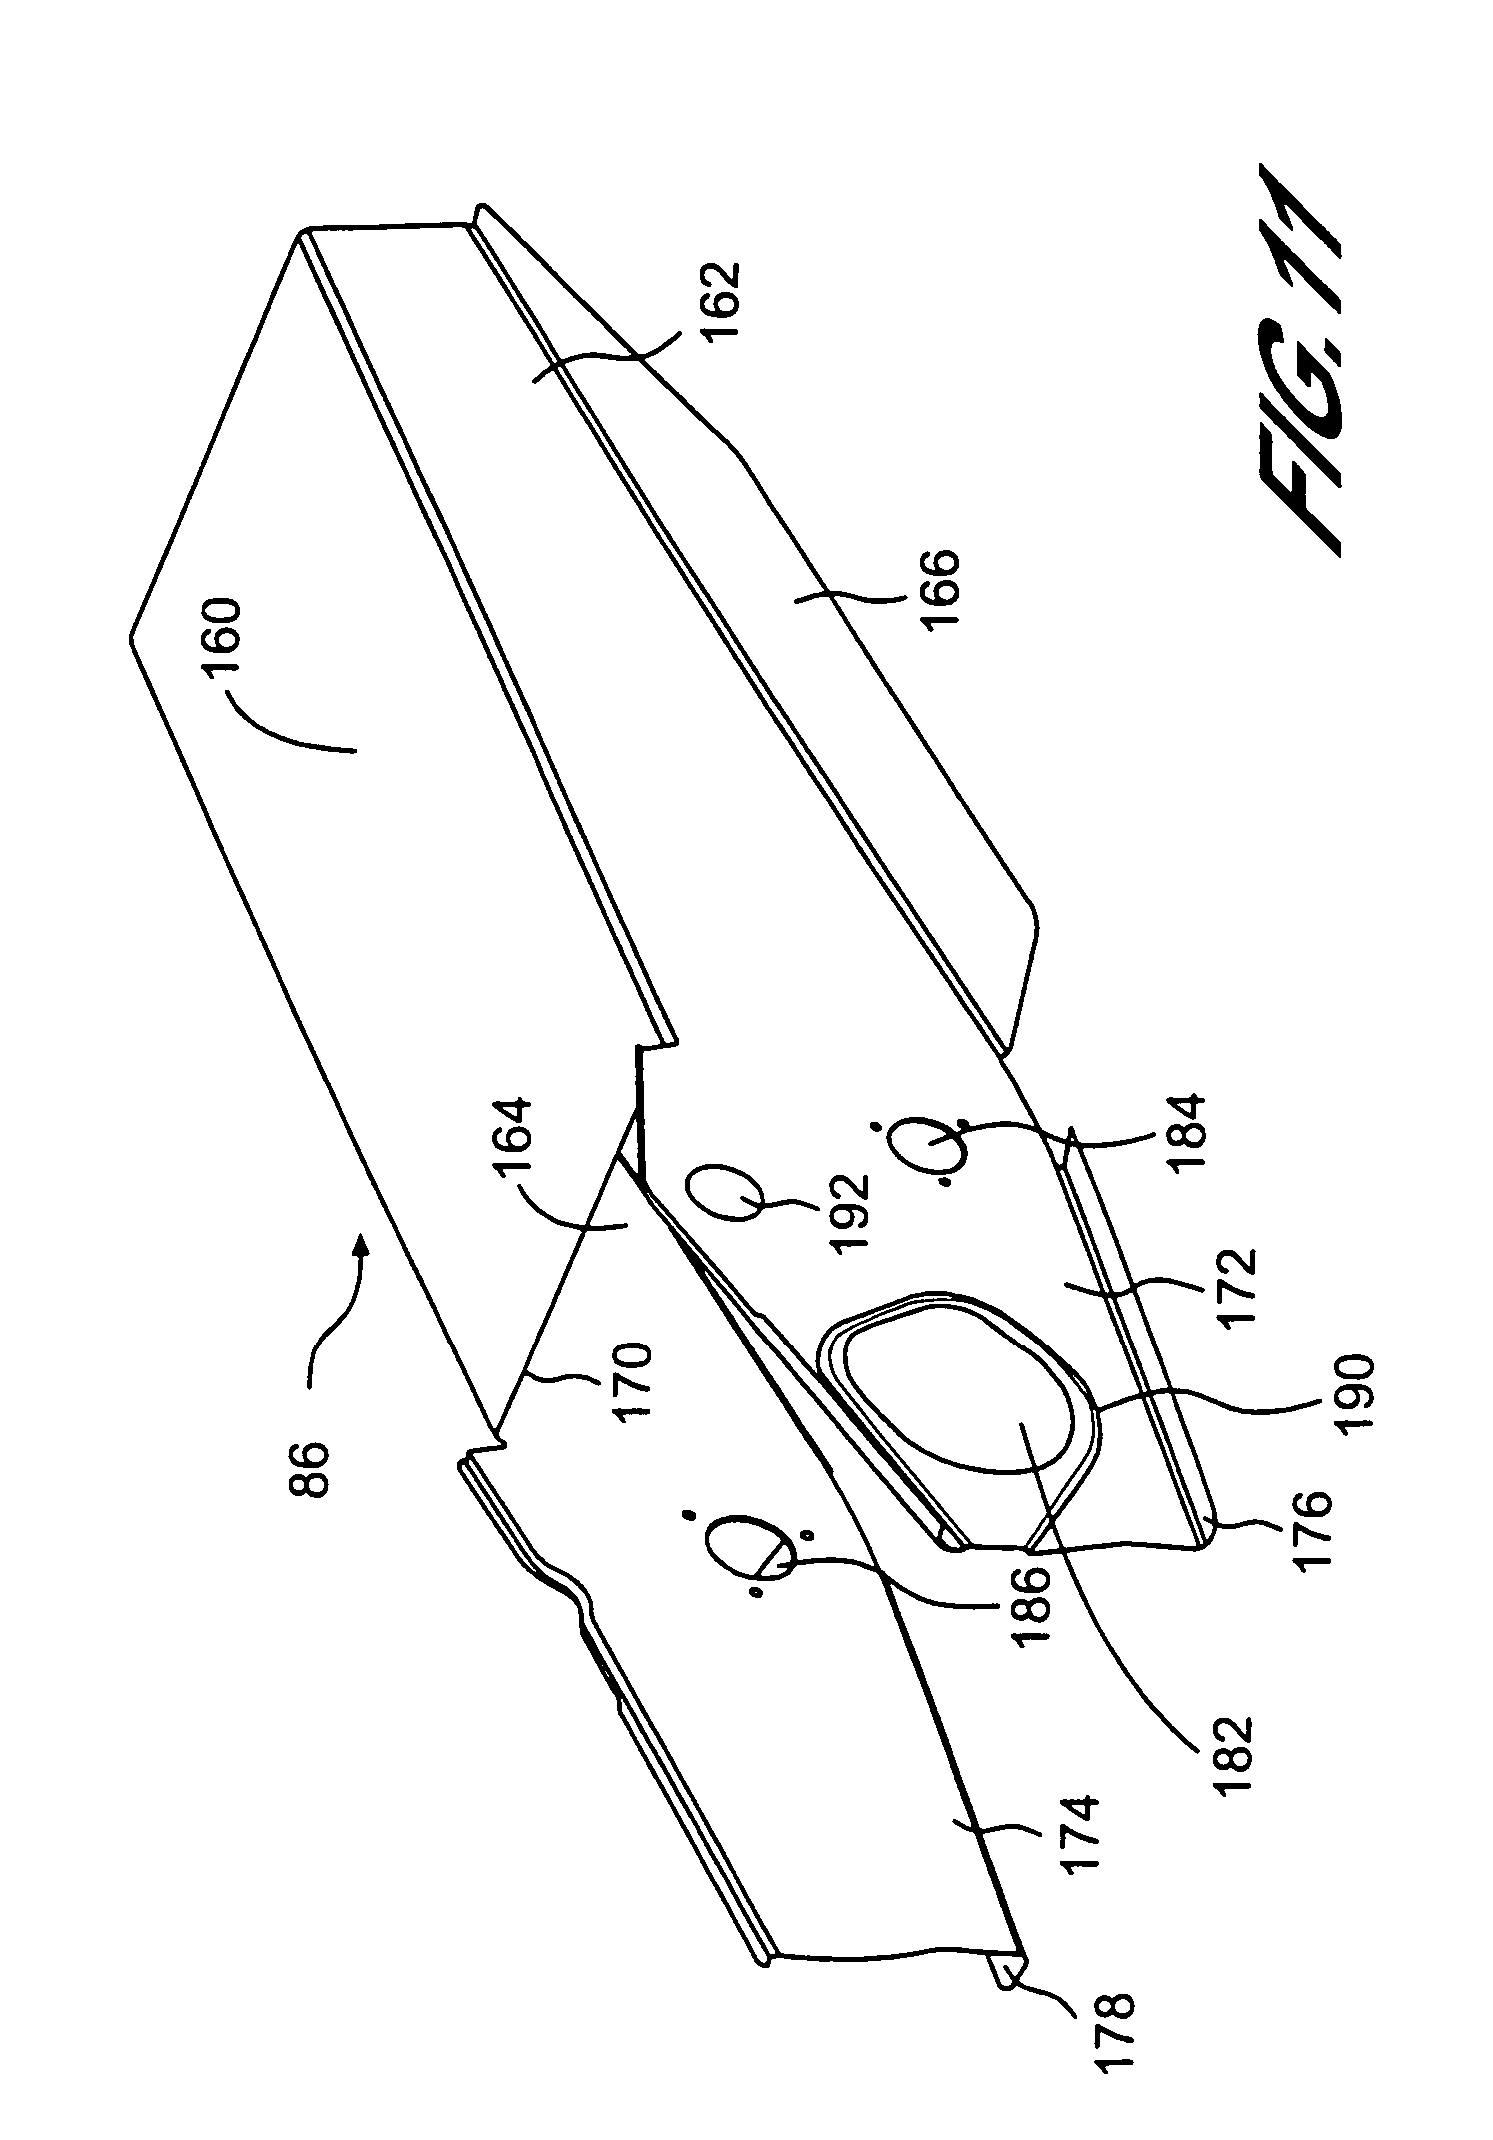 dpdt relay wiring diagram camera parts idec circuit maker